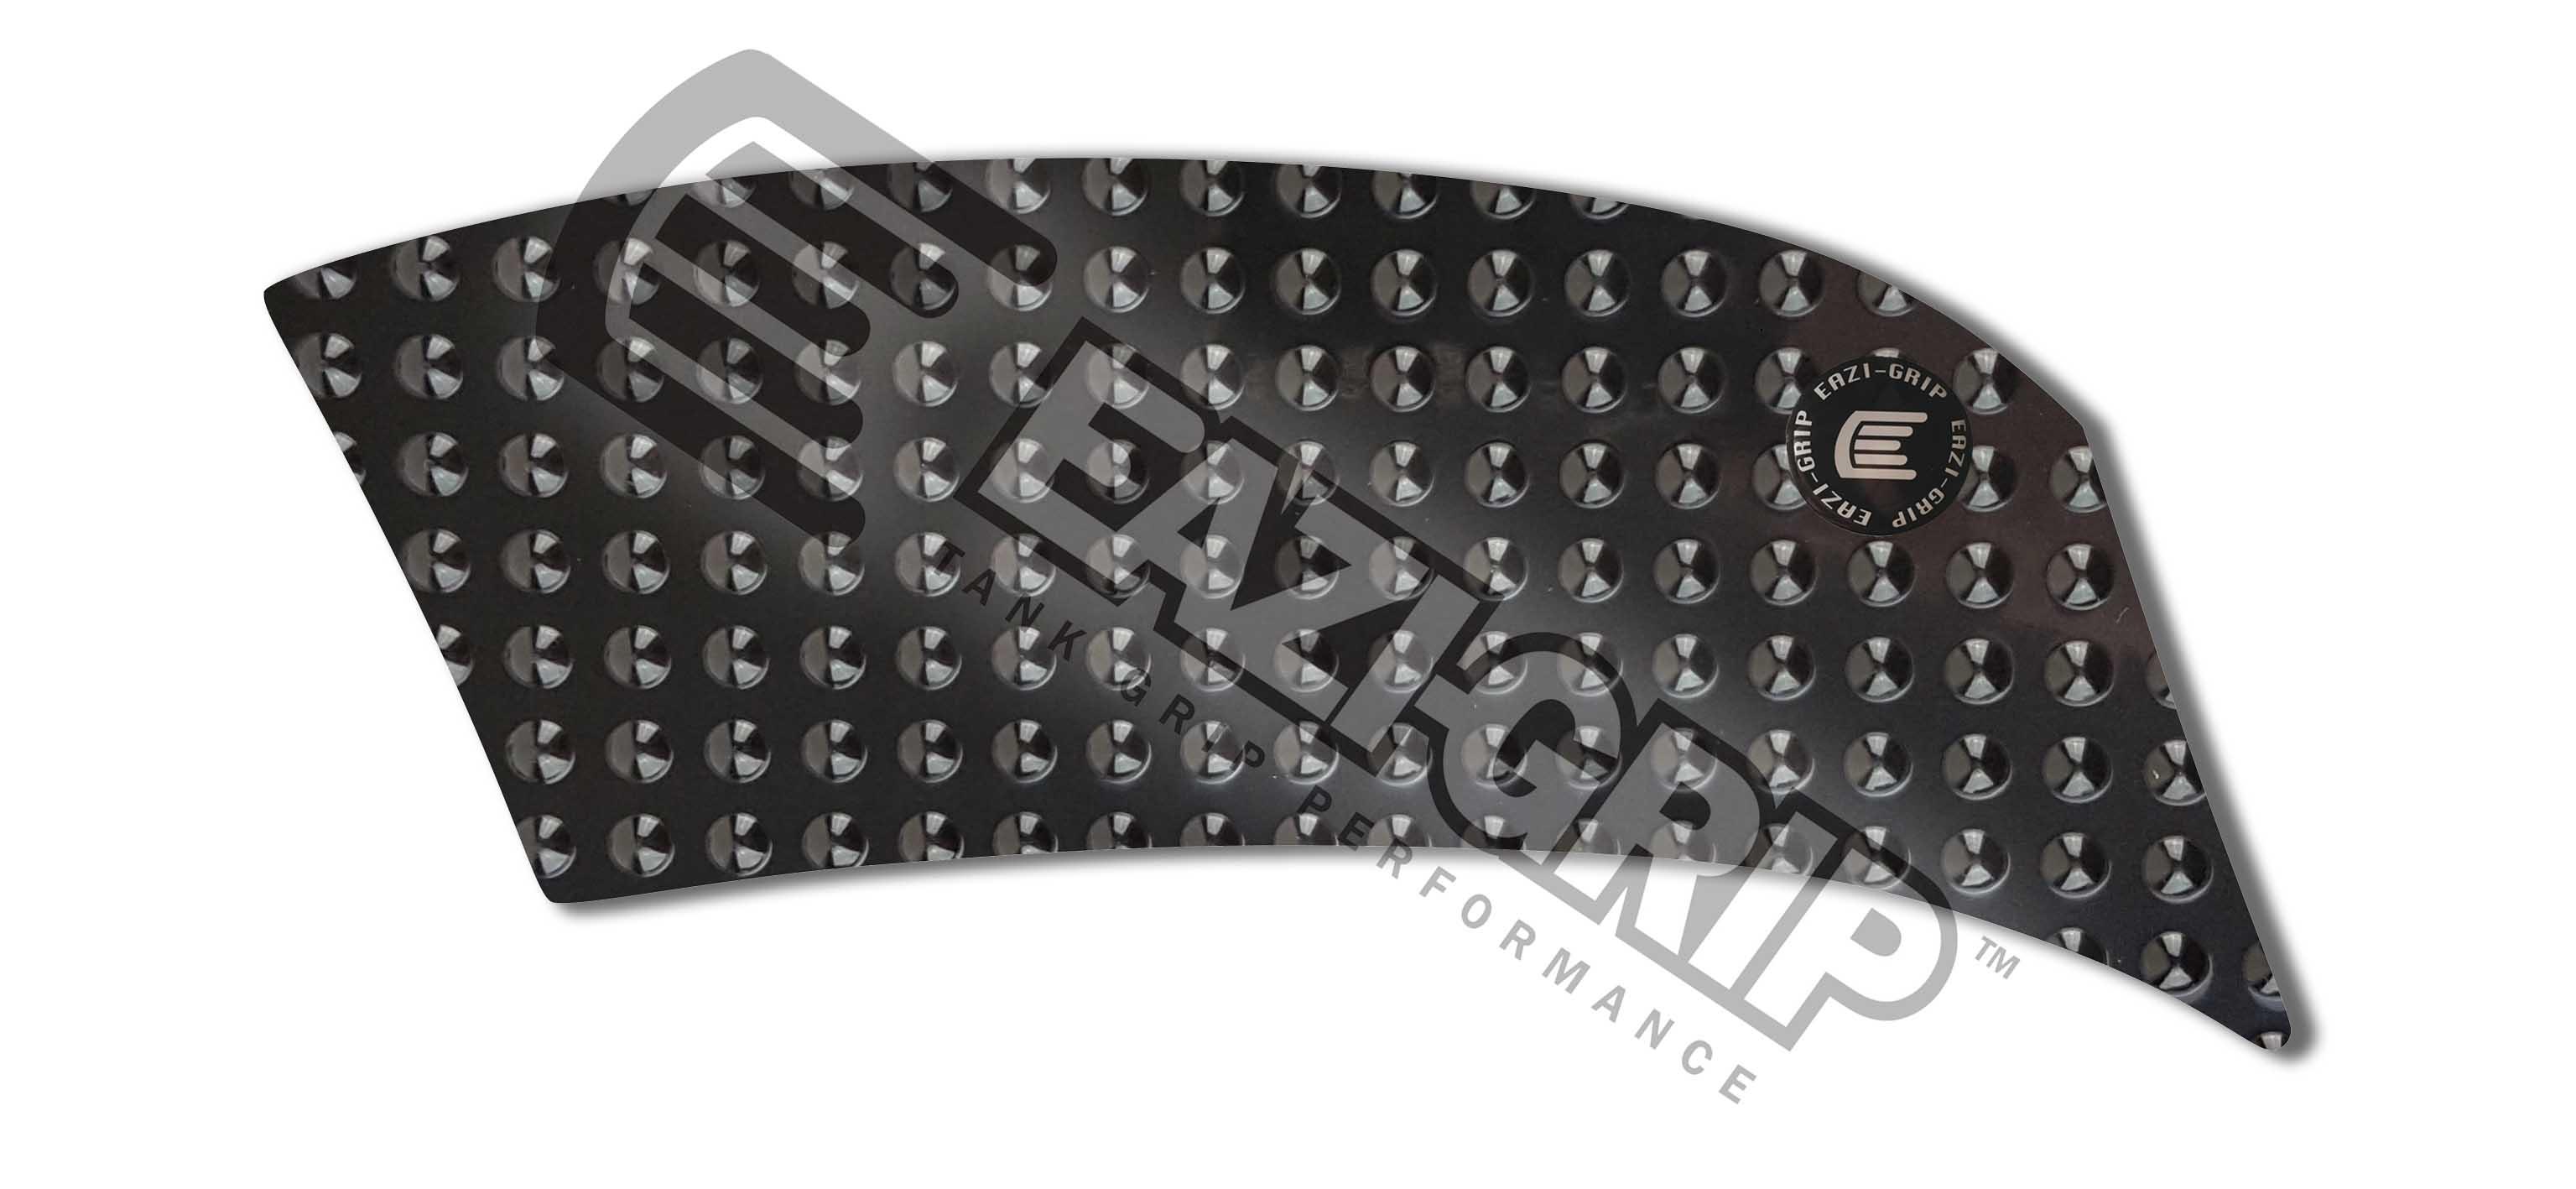 Eazi-Grip BMW 1600 GTLE 2011-2016 Black